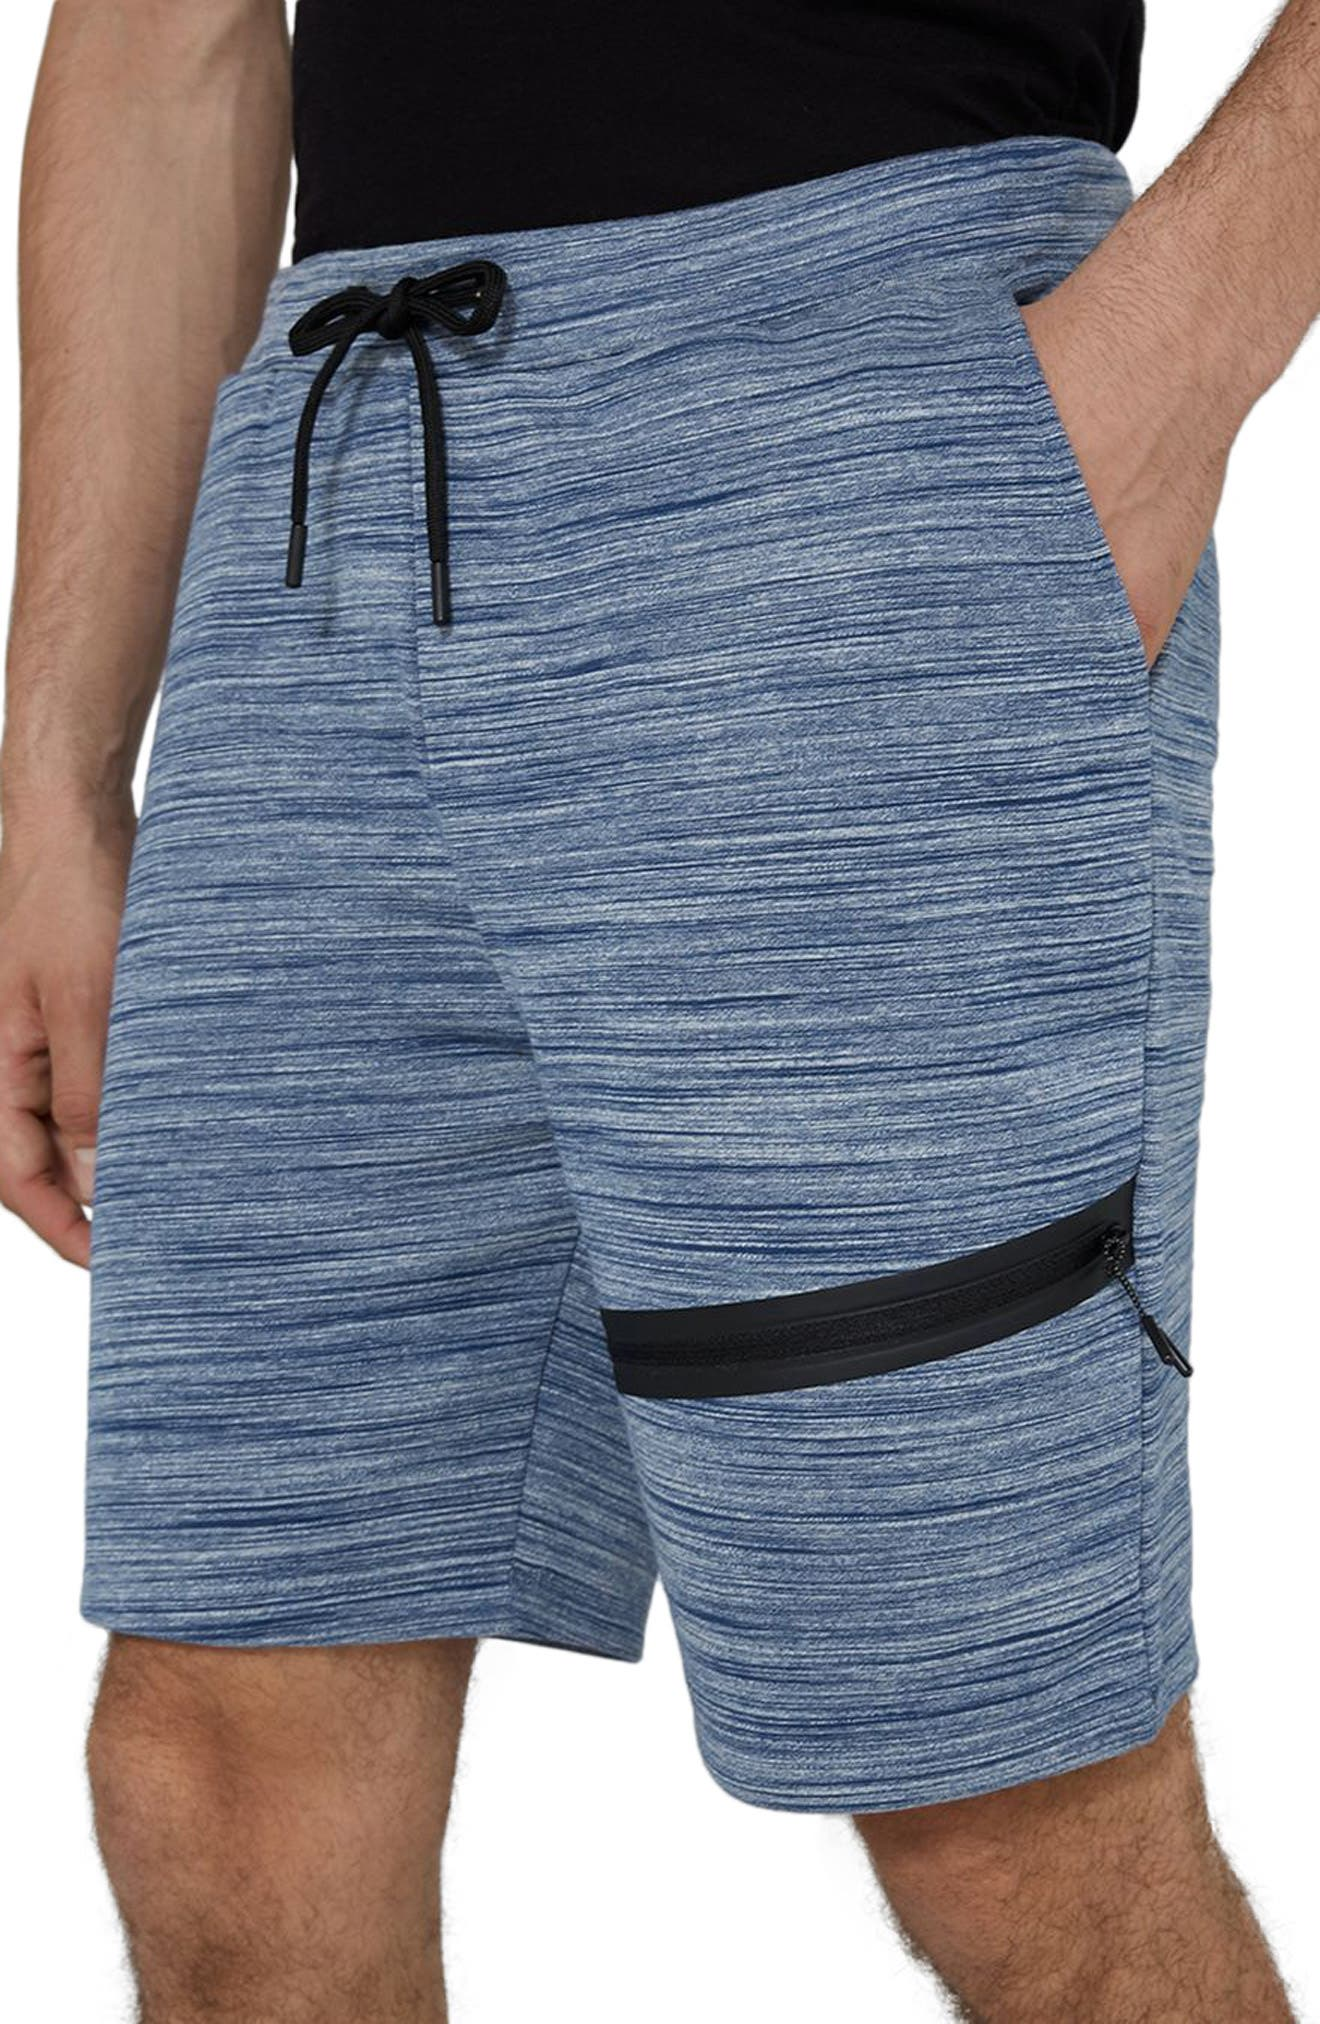 Space Dye Tech Shorts,                             Alternate thumbnail 3, color,                             Mid Blue